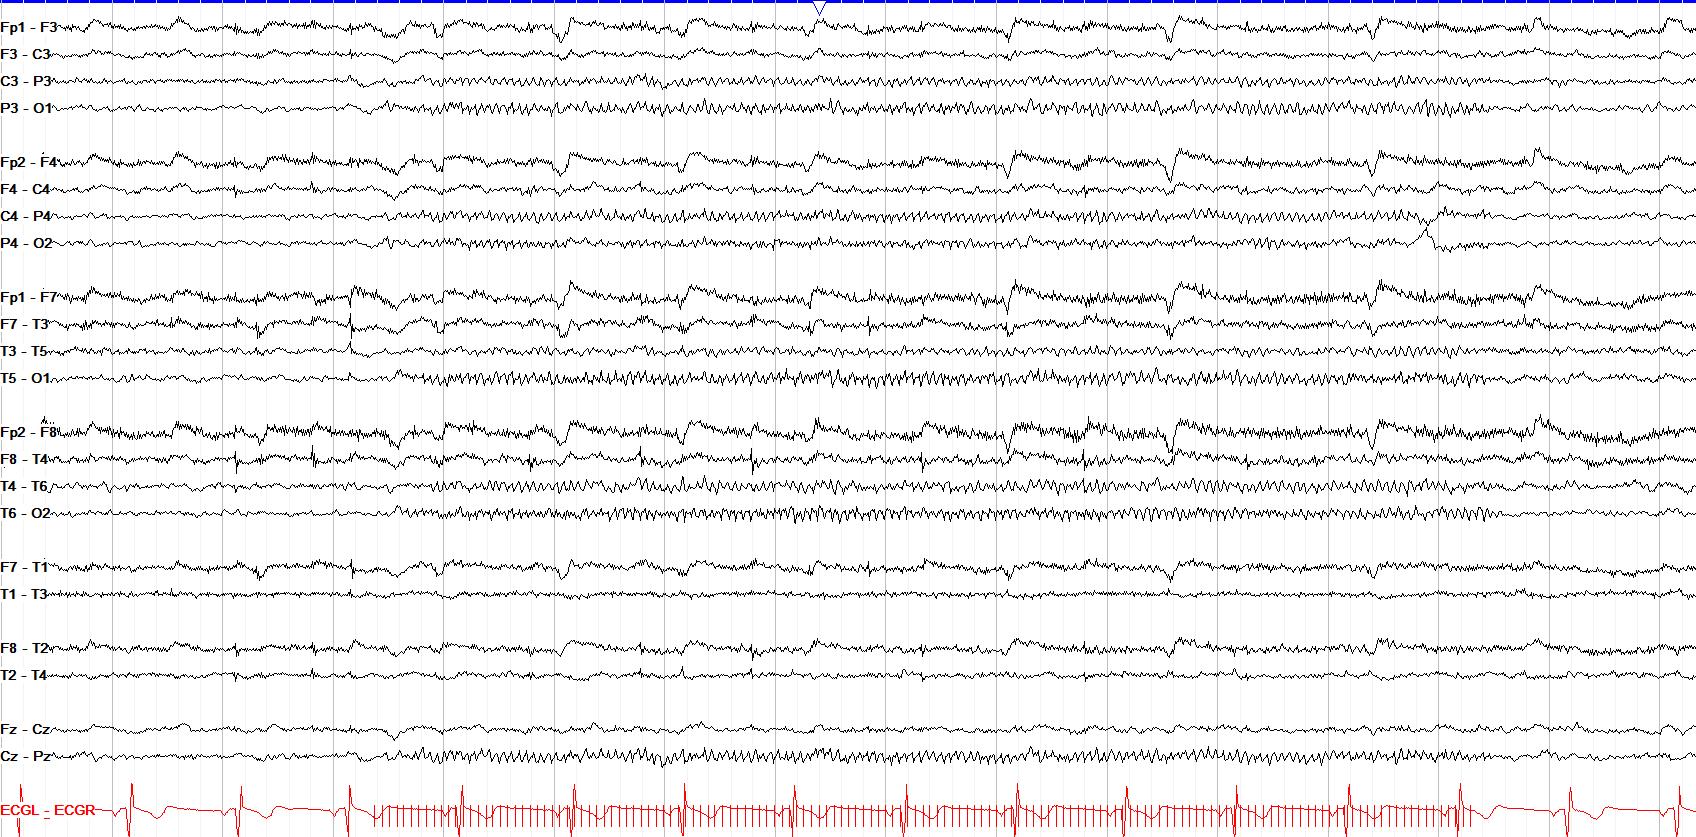 photic driving 15 Hz